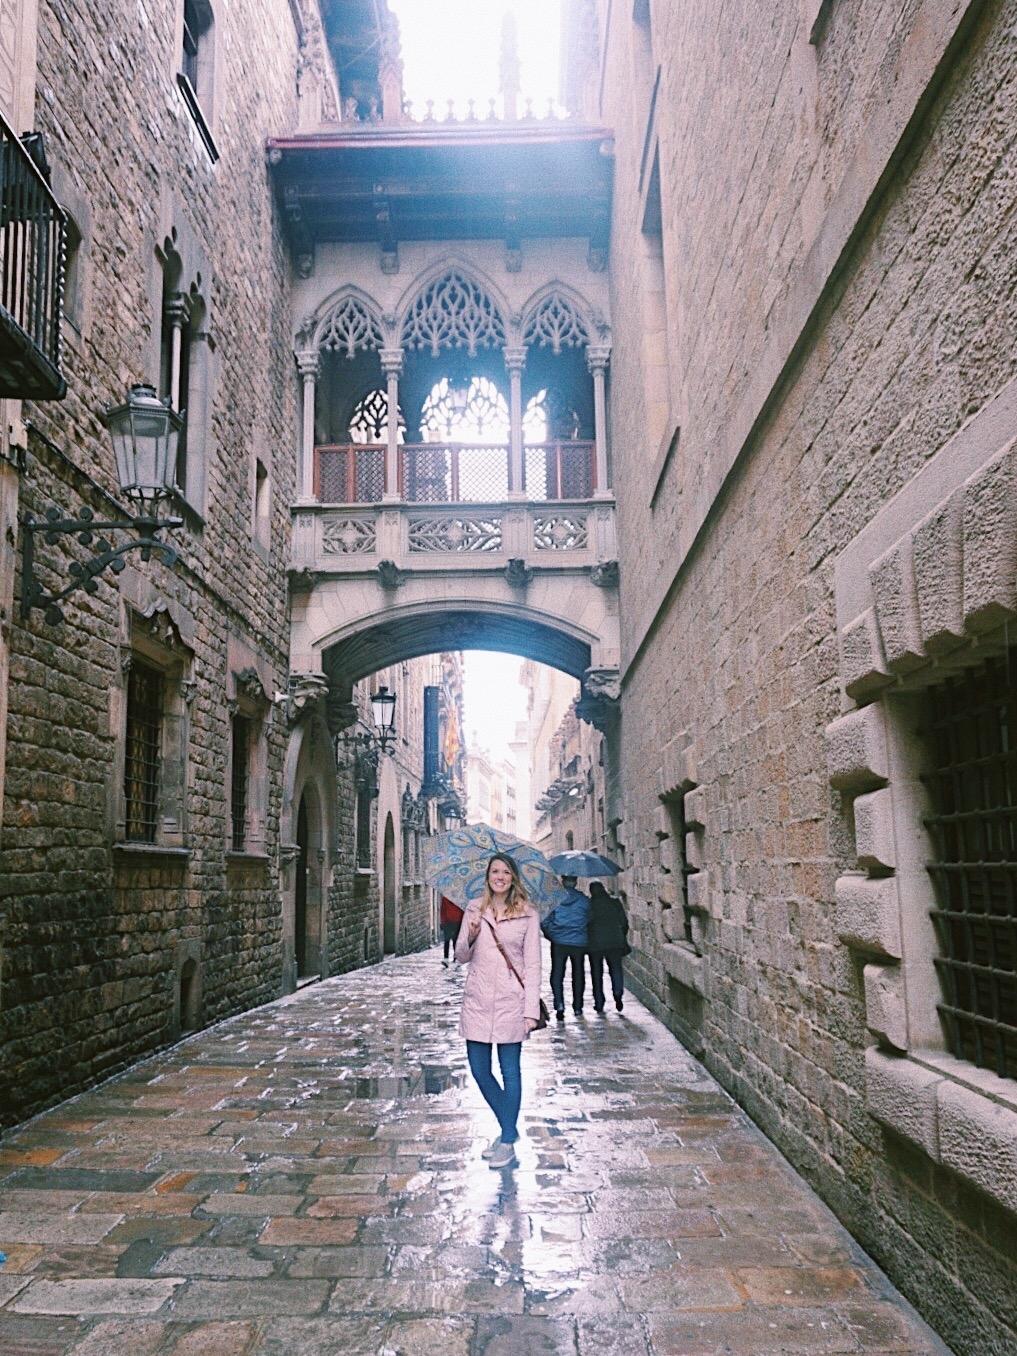 Gothic Quarter, Barcelona, Spain